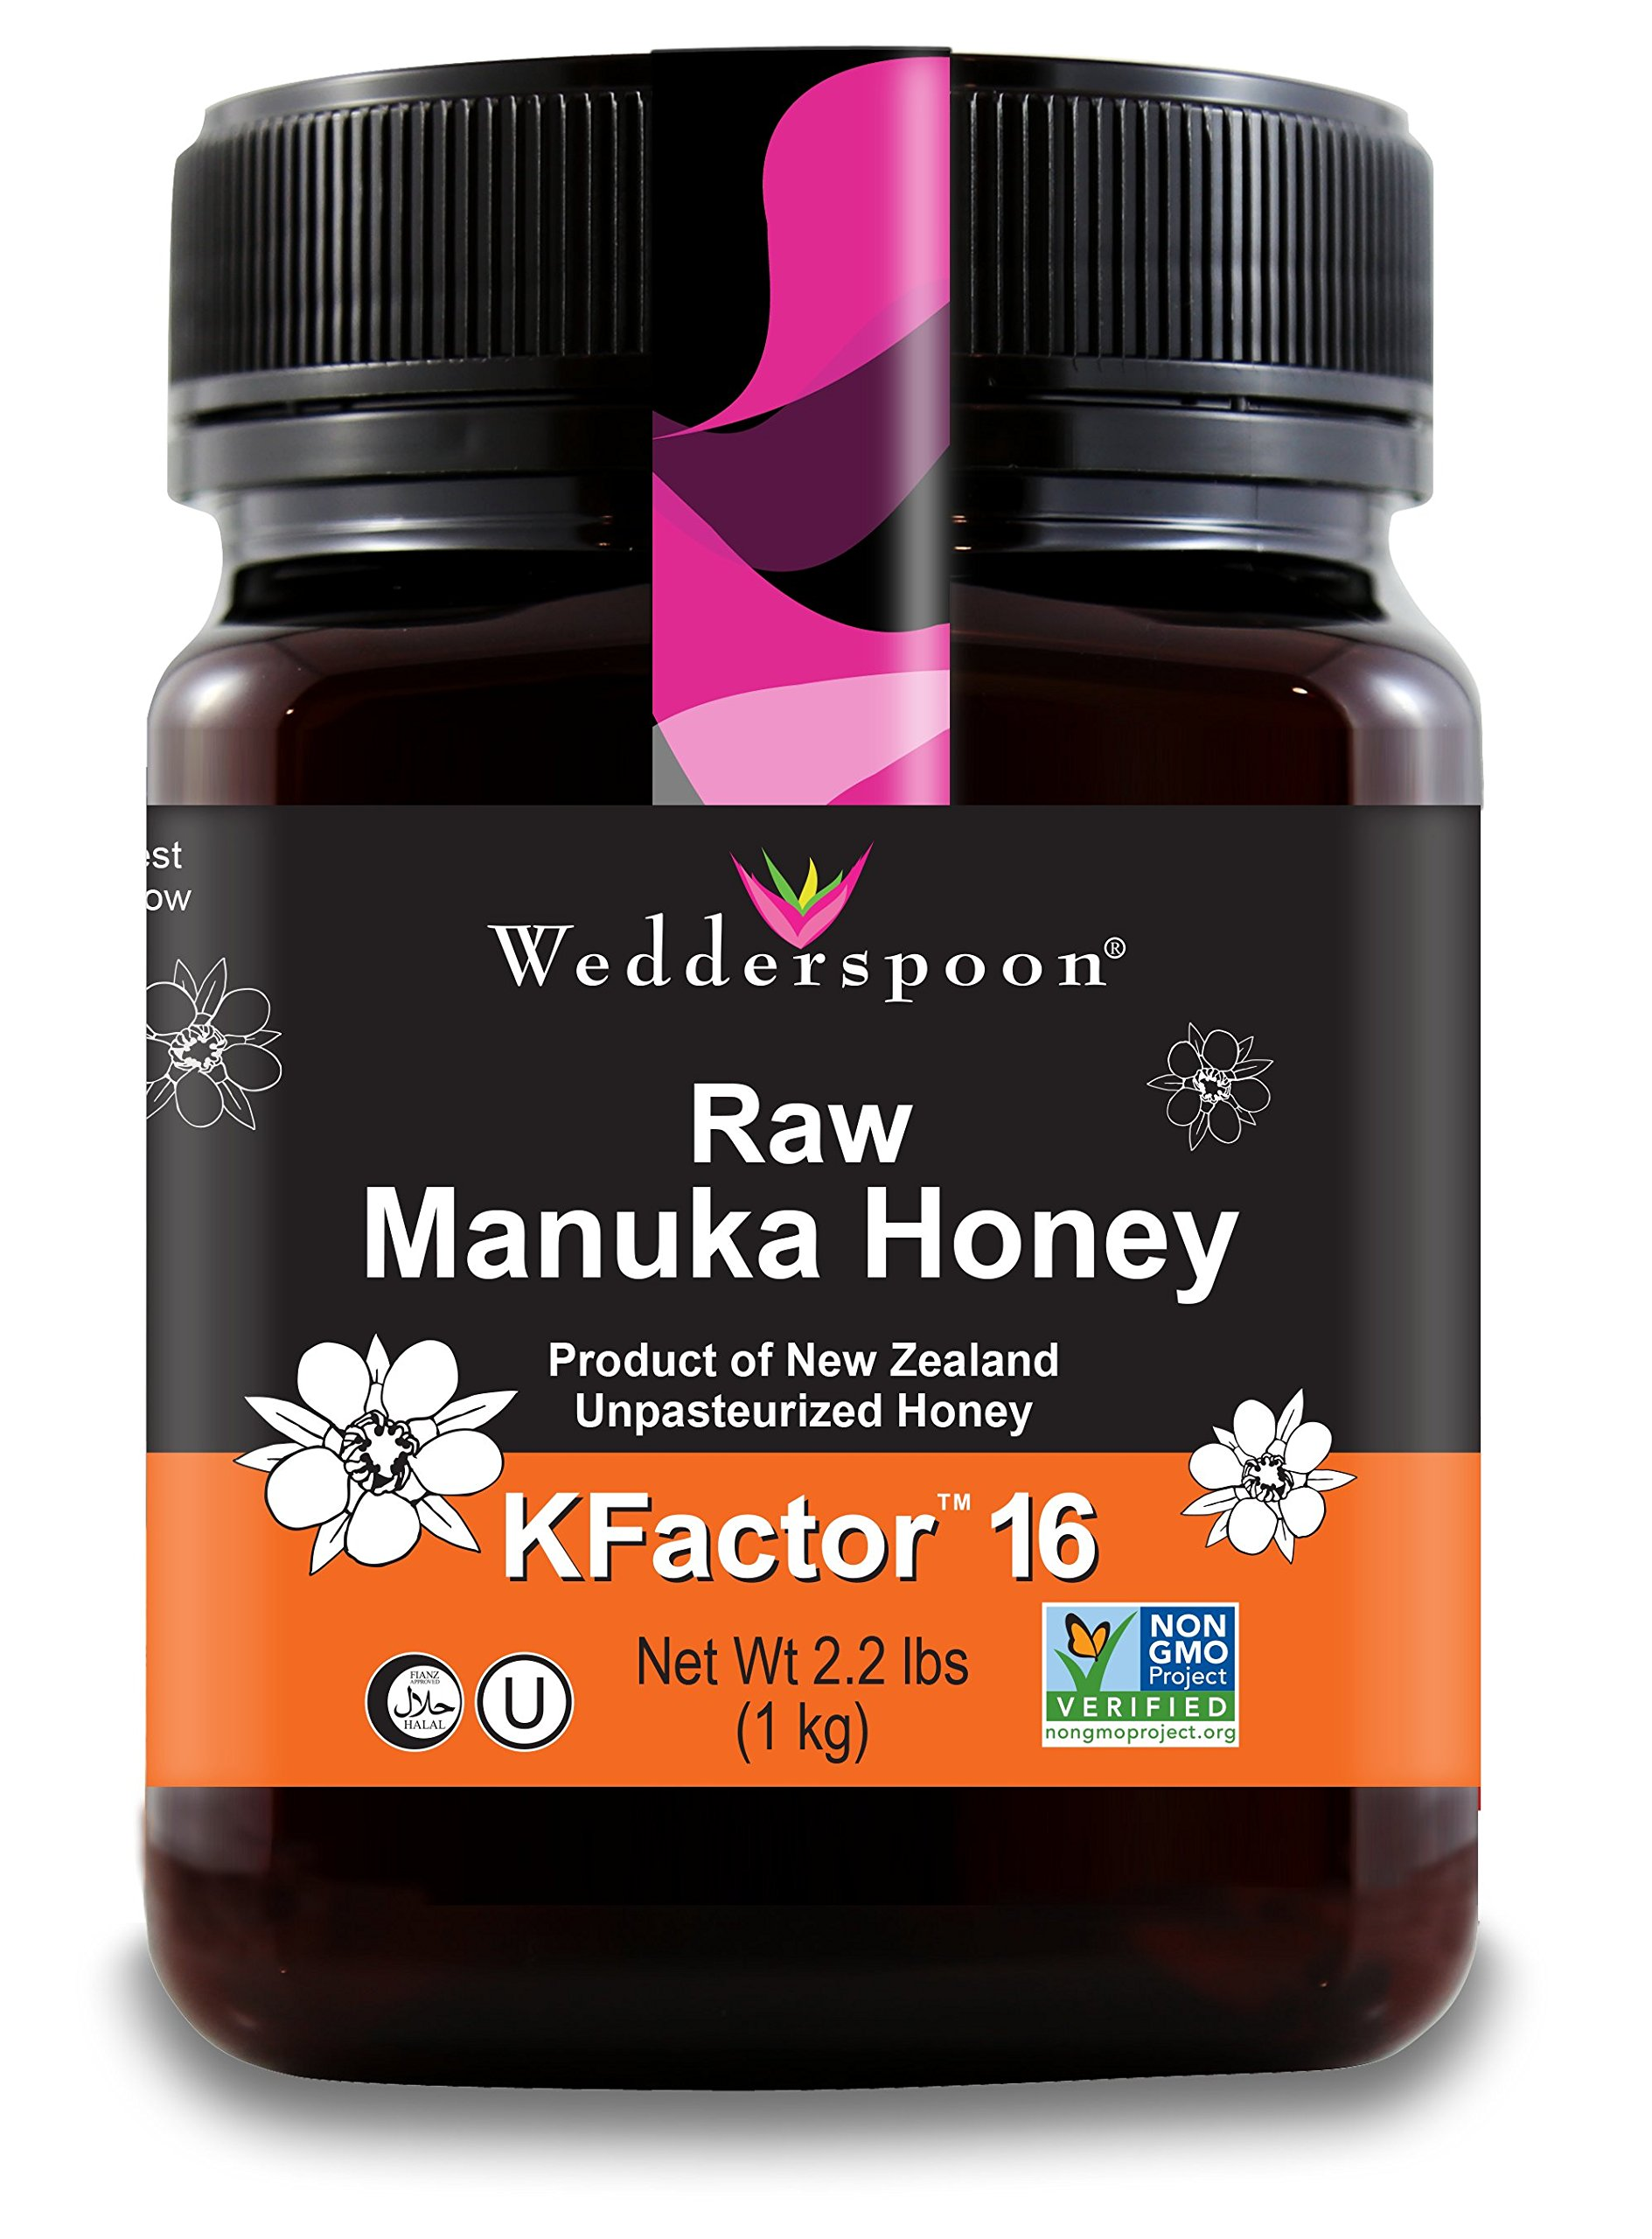 Wedderspoon Raw Premium Manuka Honey KFactor 16, Unpasteurized, Genuine New Zealand Honey, Multi-Functional, Non-GMO Superfood, 35.2 oz